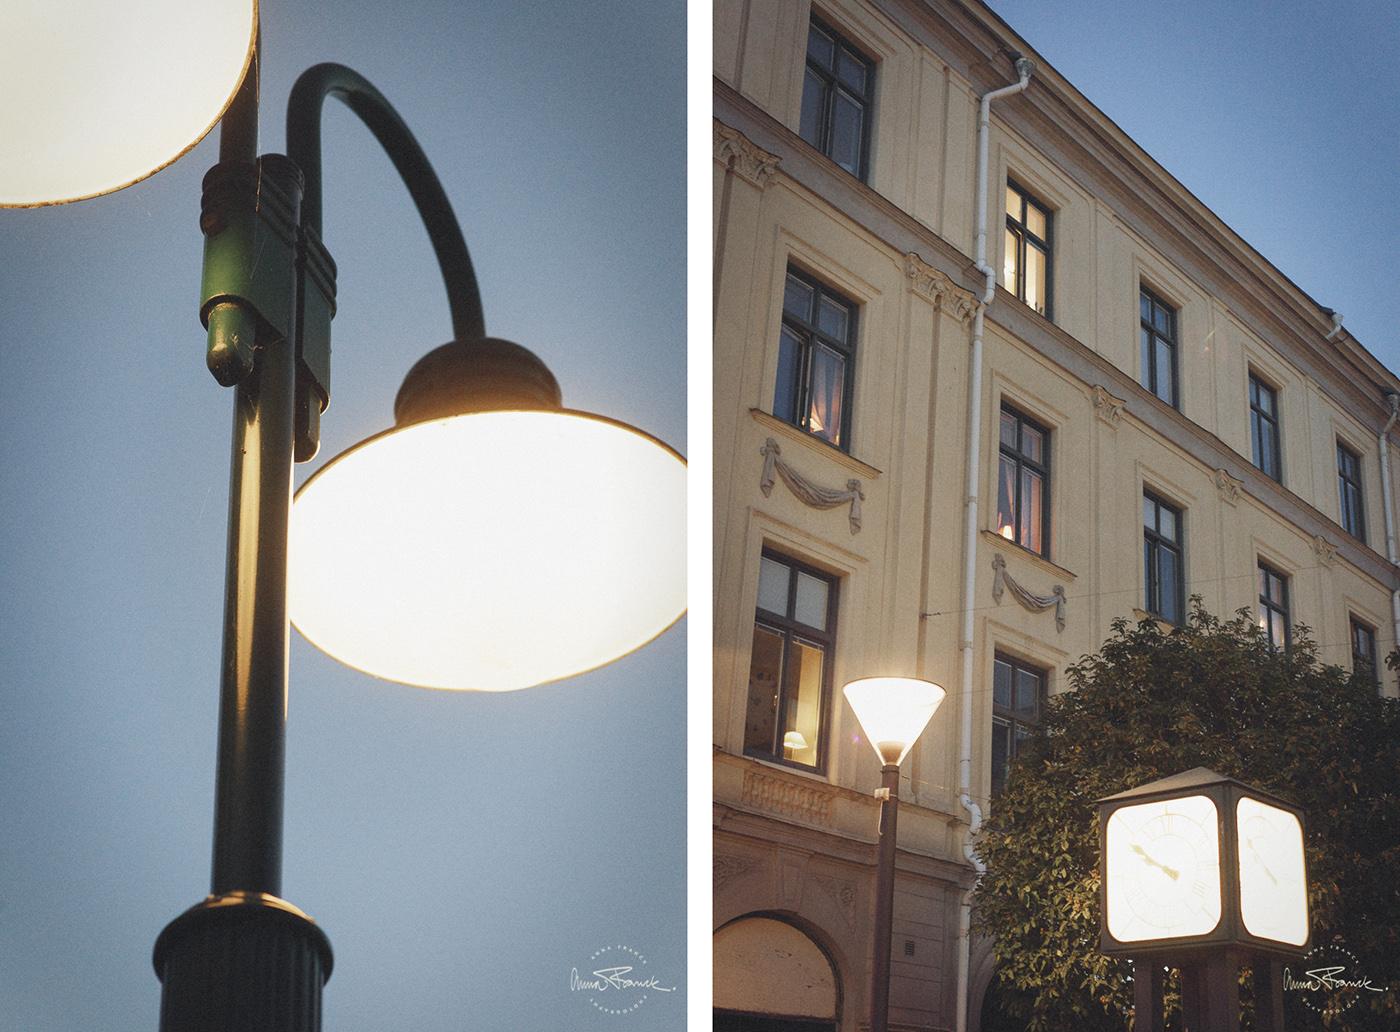 anna, franck, photography, softlight, karlstad, reflections, urban, stad, details, detaljer, statues, twilight, statyer, summer, sommar, svensk, swedish, architecture